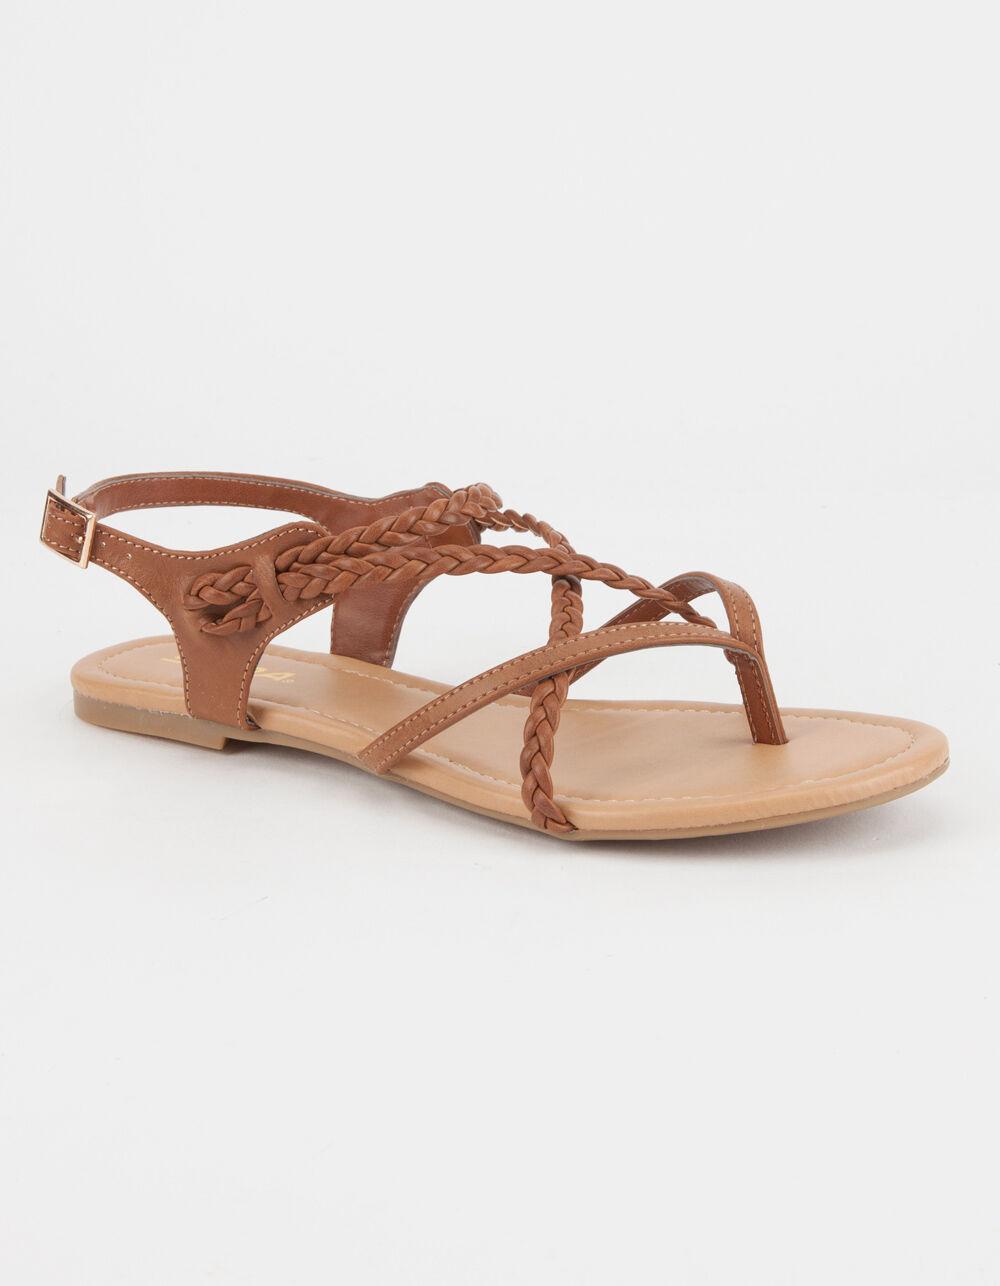 SODA Criss Cross Braided Sandals